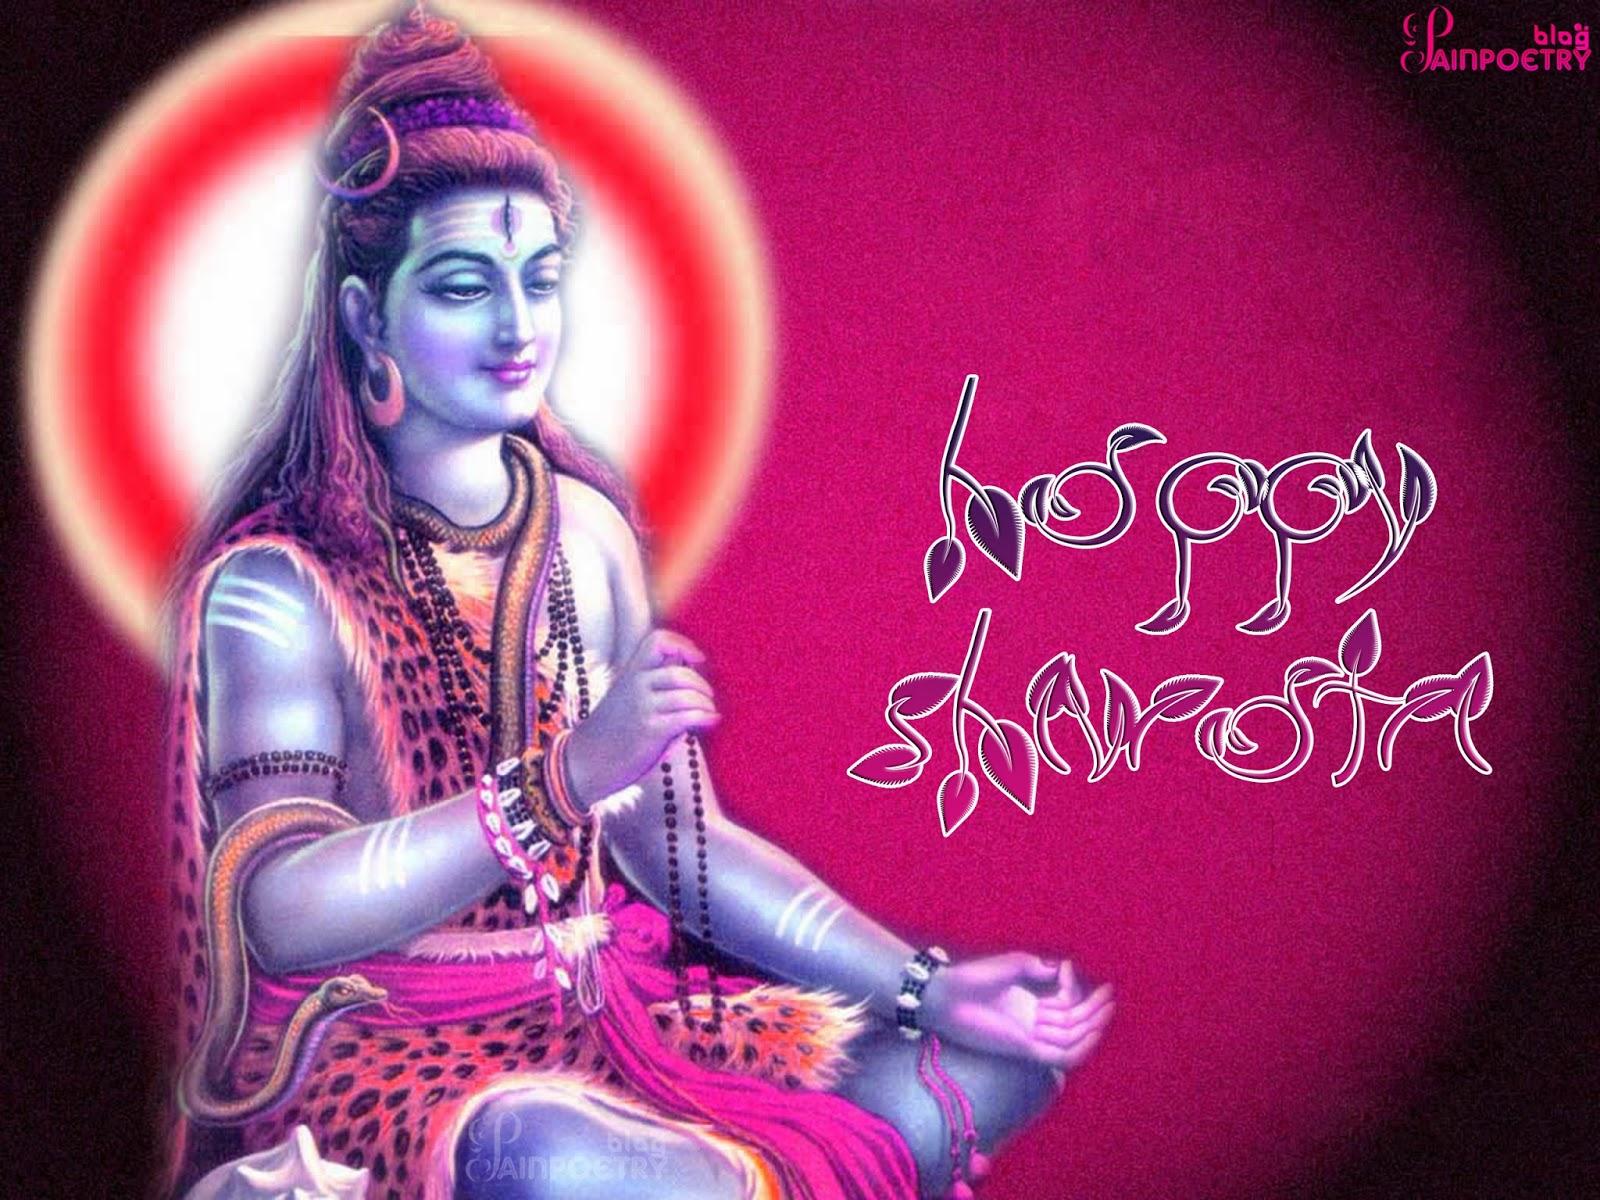 Happy-Shivratri-Wishes-Wallpaper-Image-Photo-Wallpaper-Wide